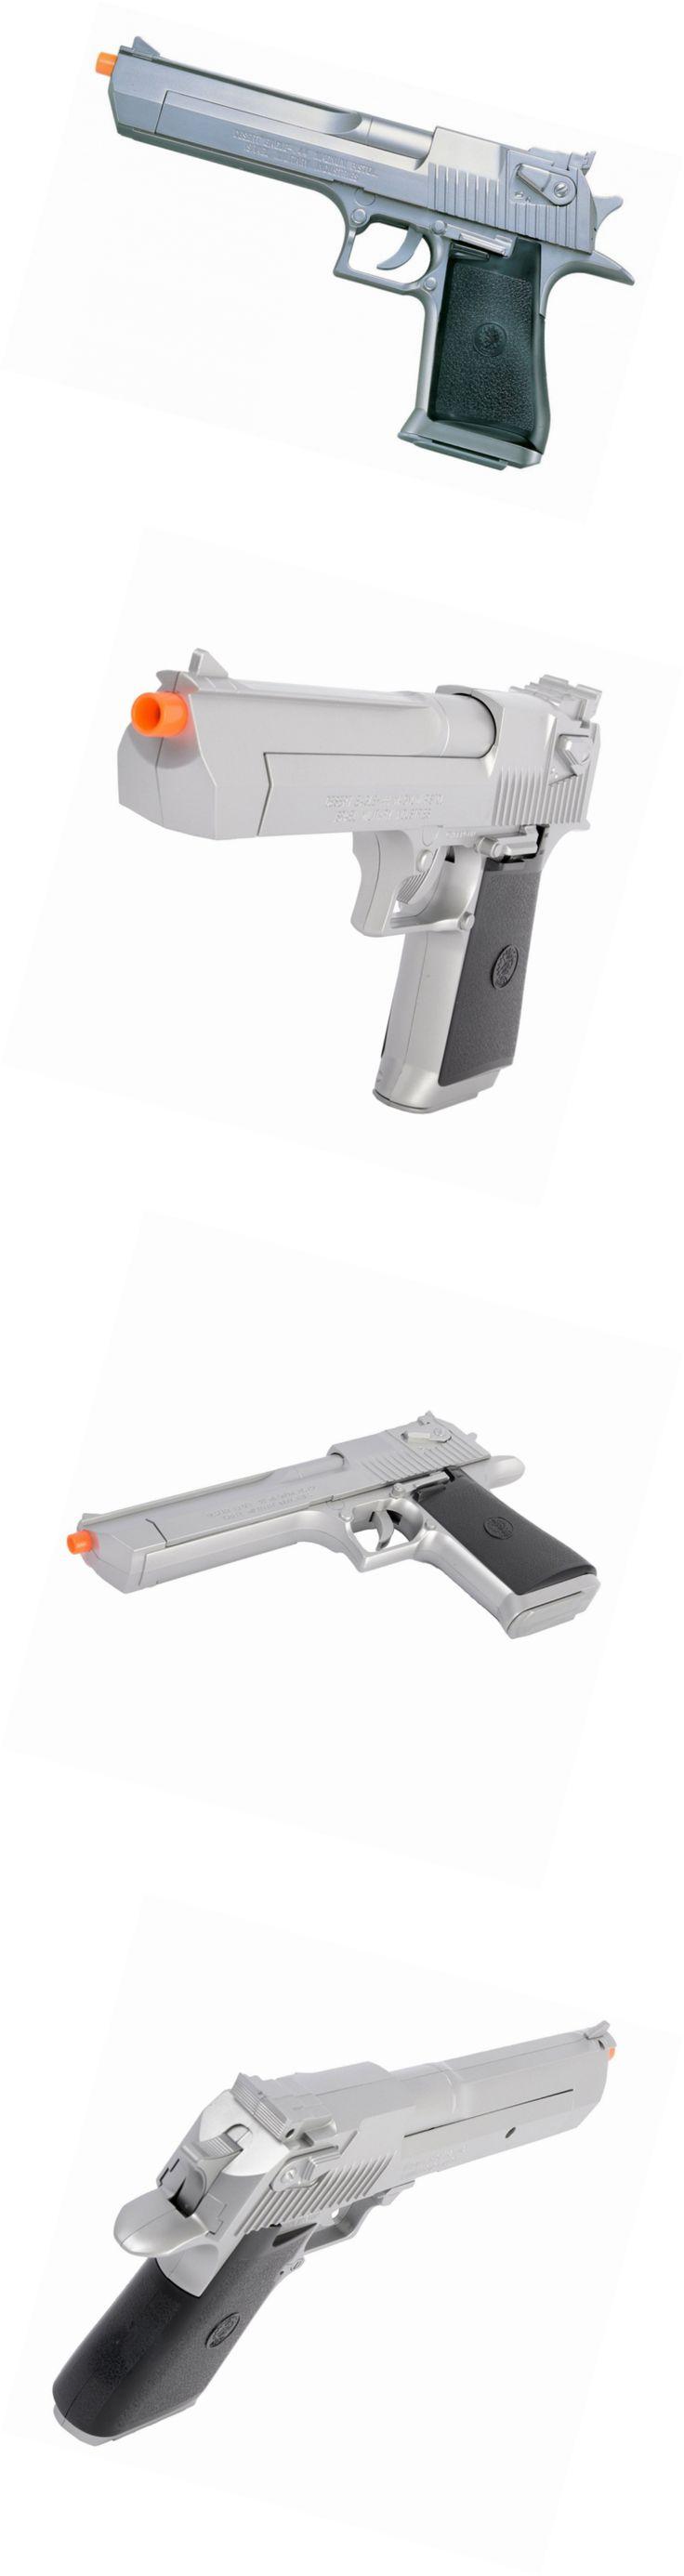 Pistol 160923: Soft Air Desert Eagle .44 Magnum Spring Powered Airsoft Pistol - Gun Pistols Toy BUY IT NOW ONLY: $33.99